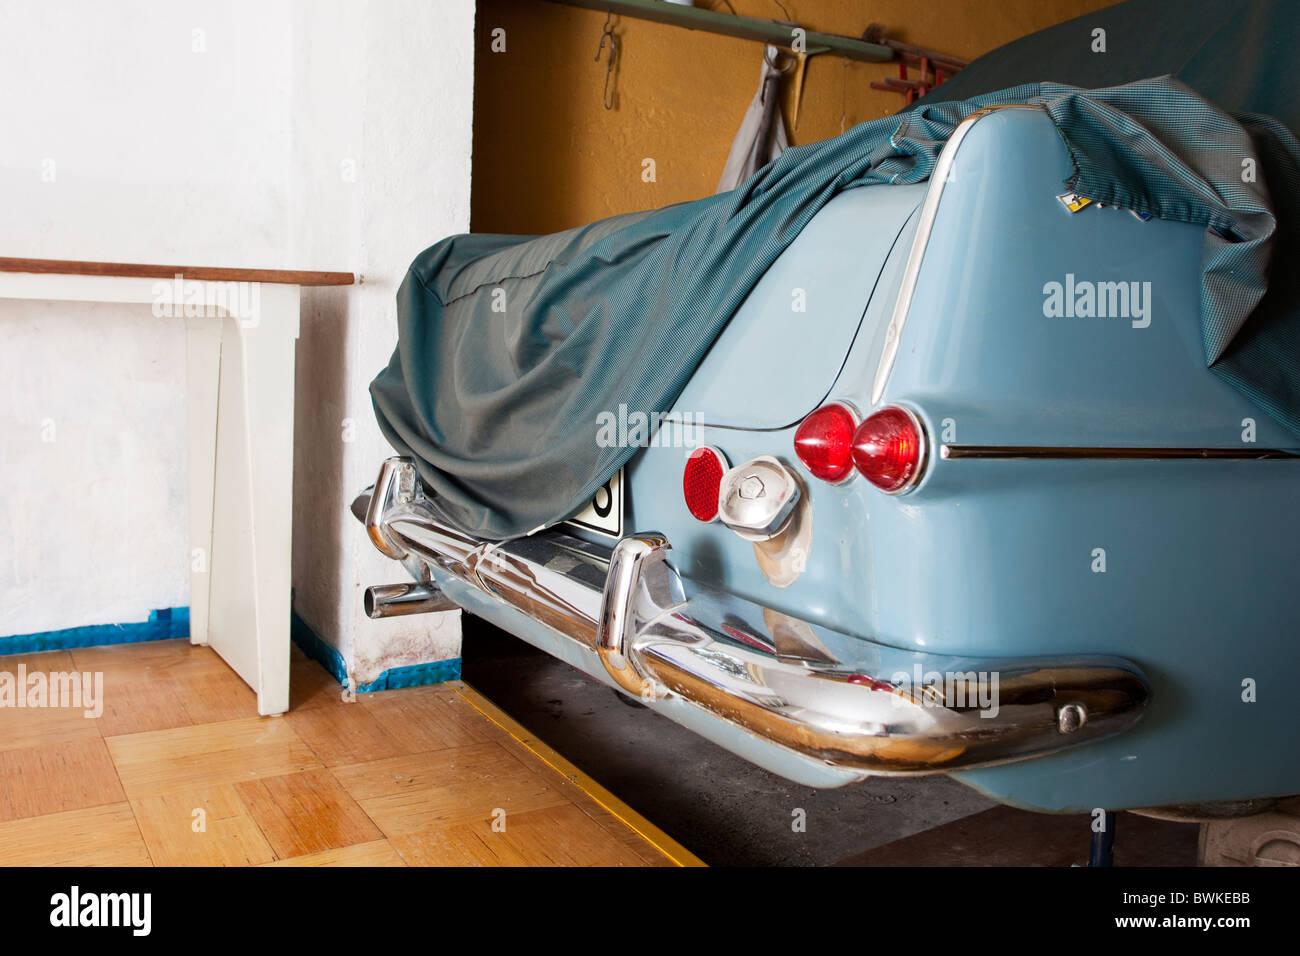 Old car in the garage.Eskilstuna,Sweden - Stock Image